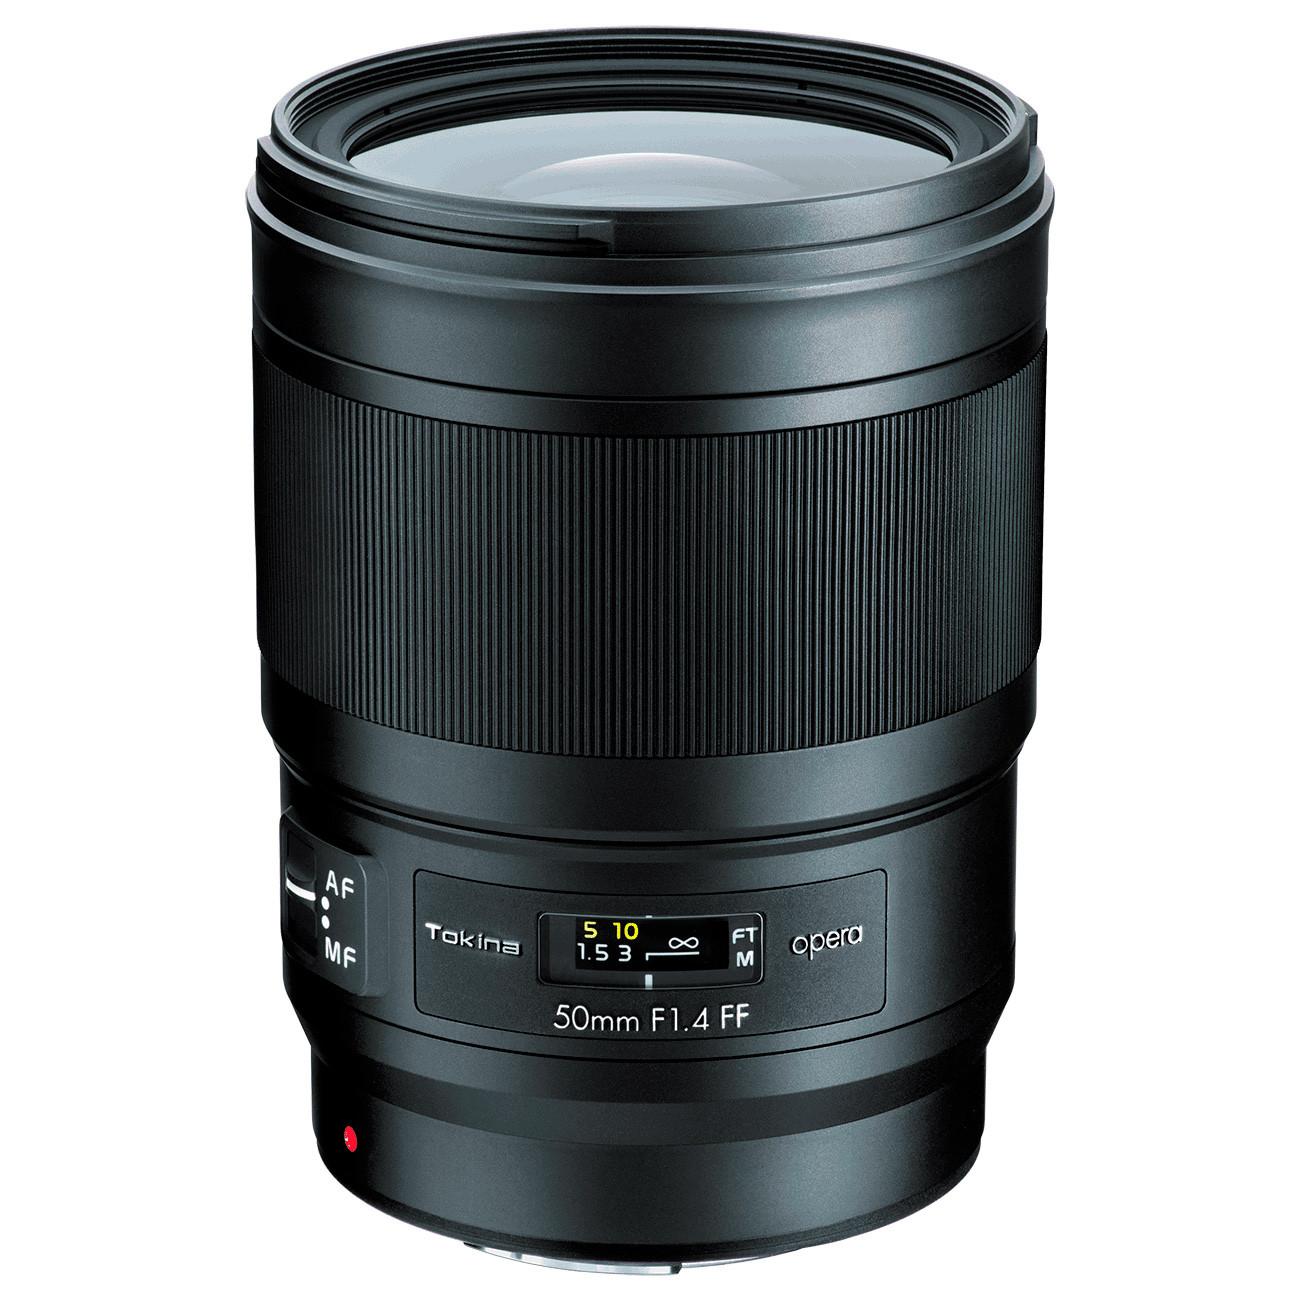 Объектив Tokina OPERA FX 50mm f/1.4 (Nikon)